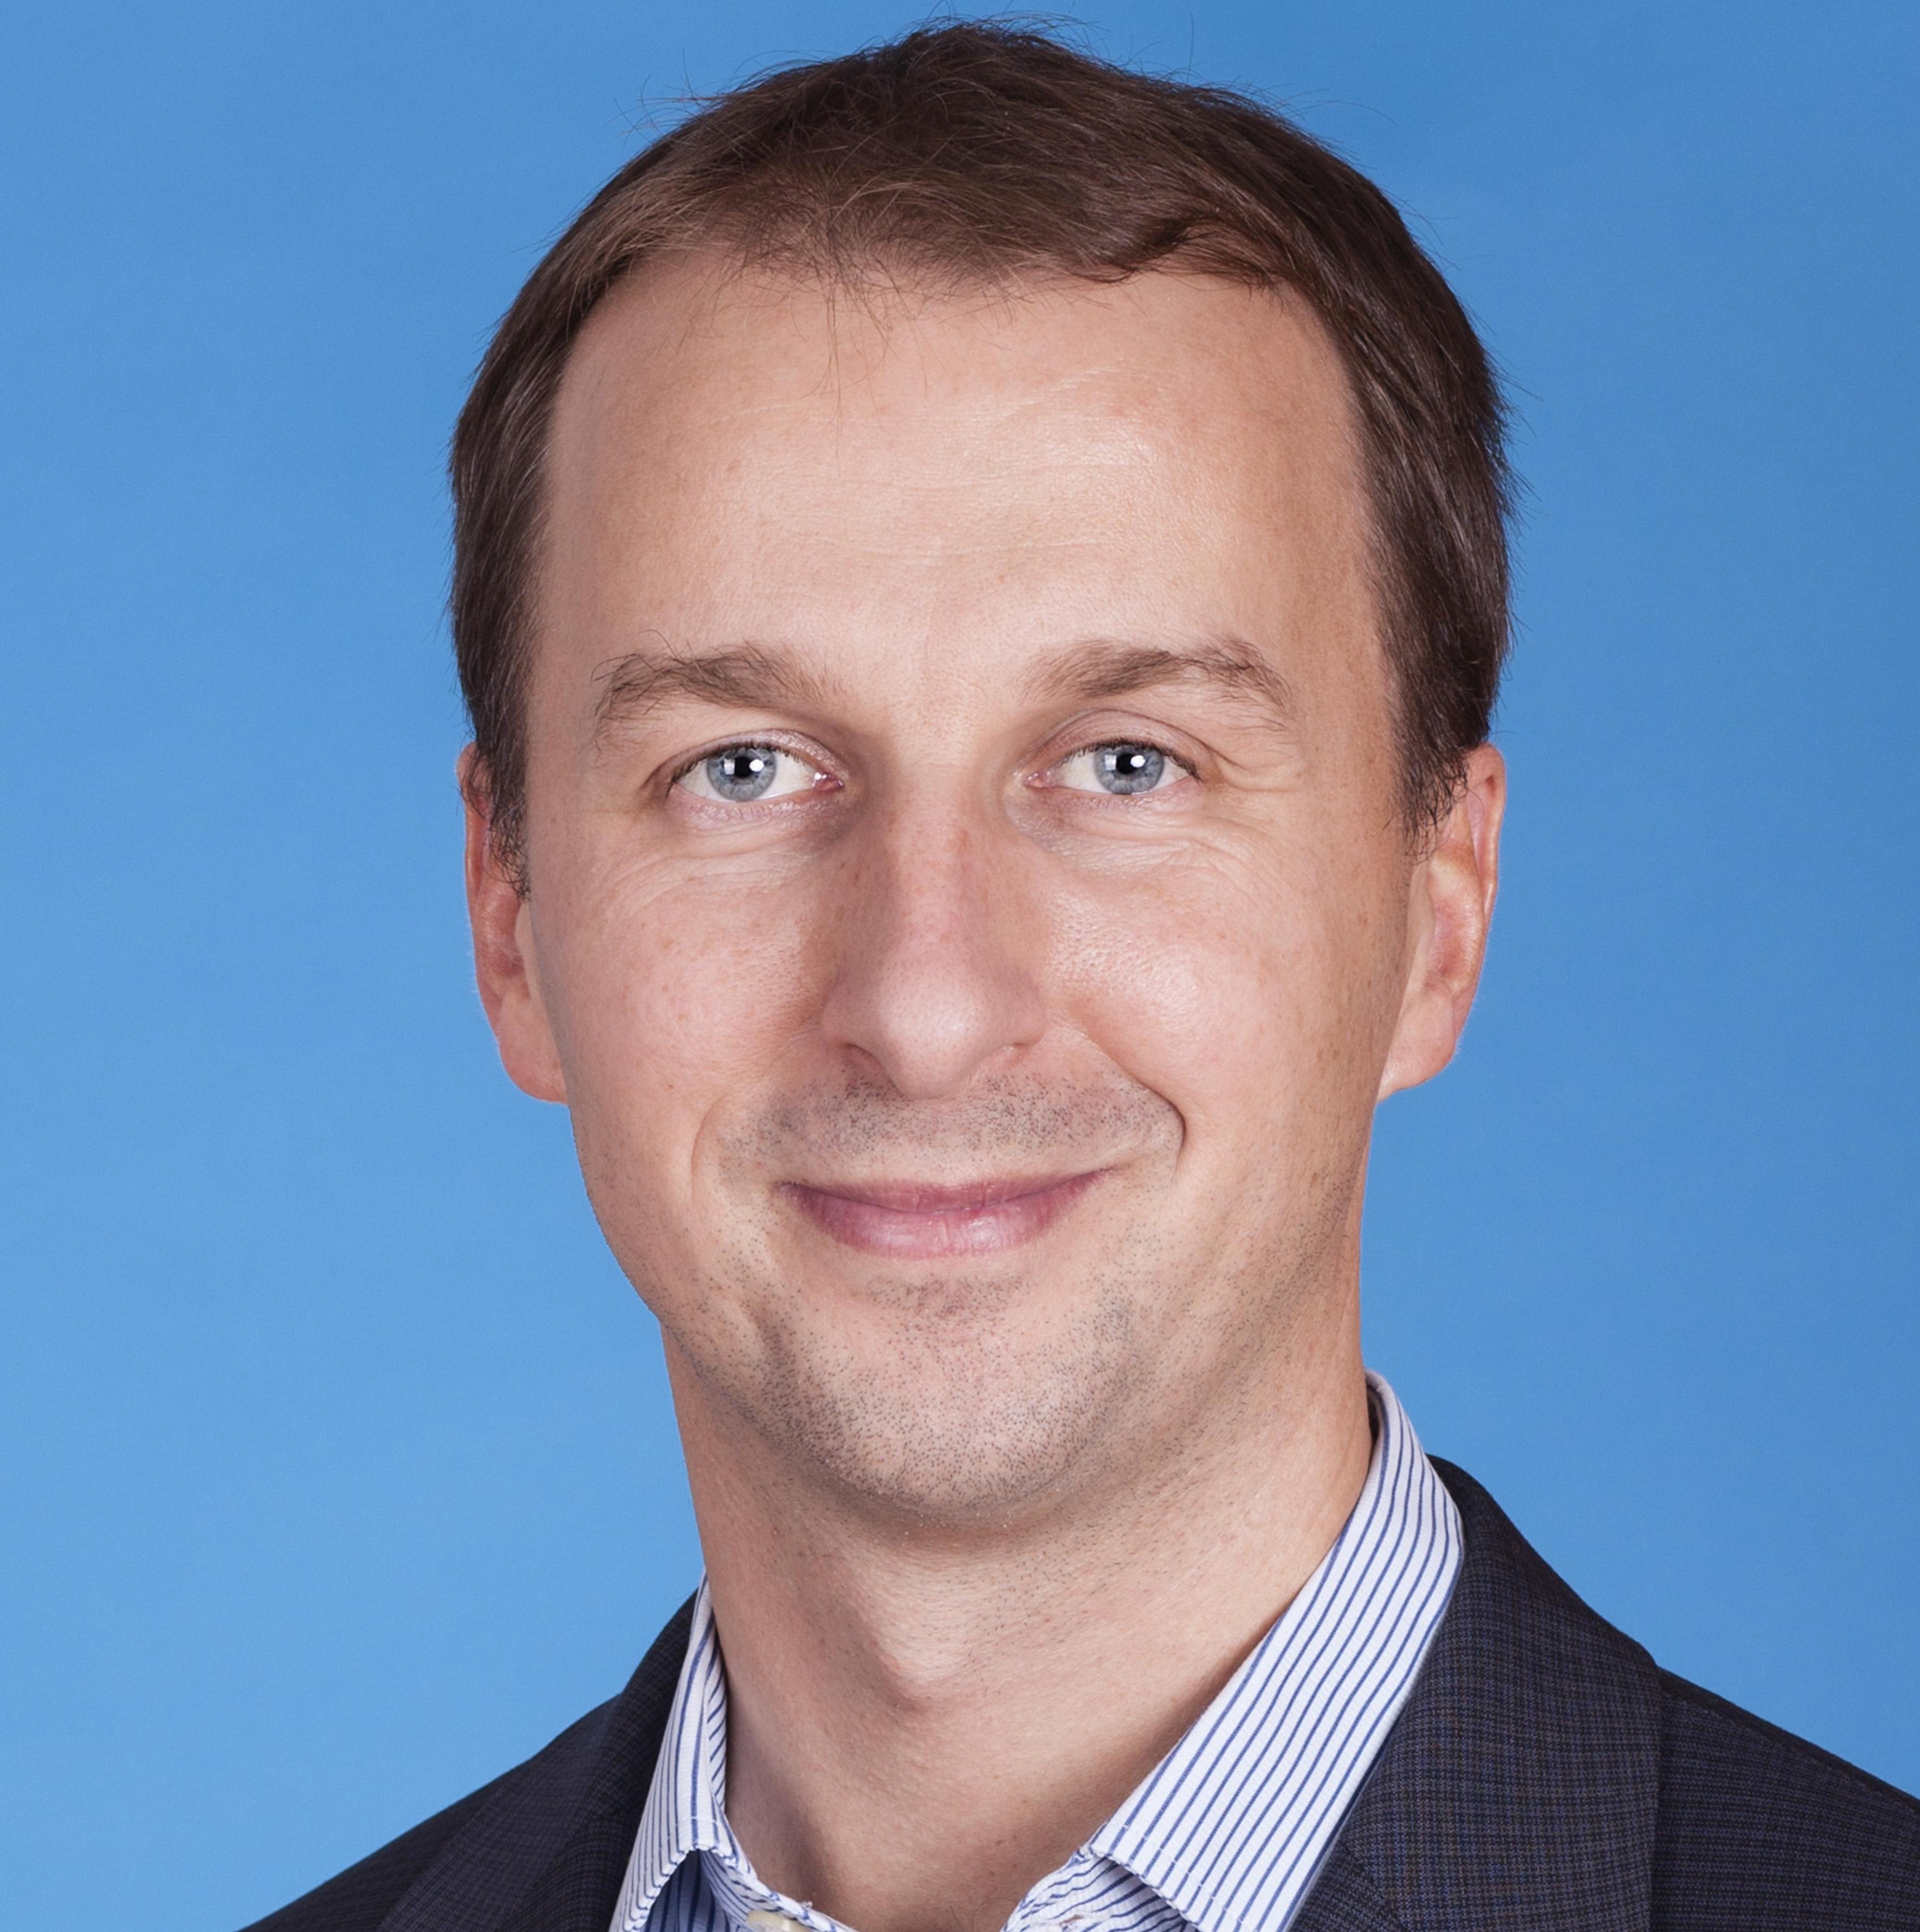 Marián Jánoš (DANONE/NUTRICIA)